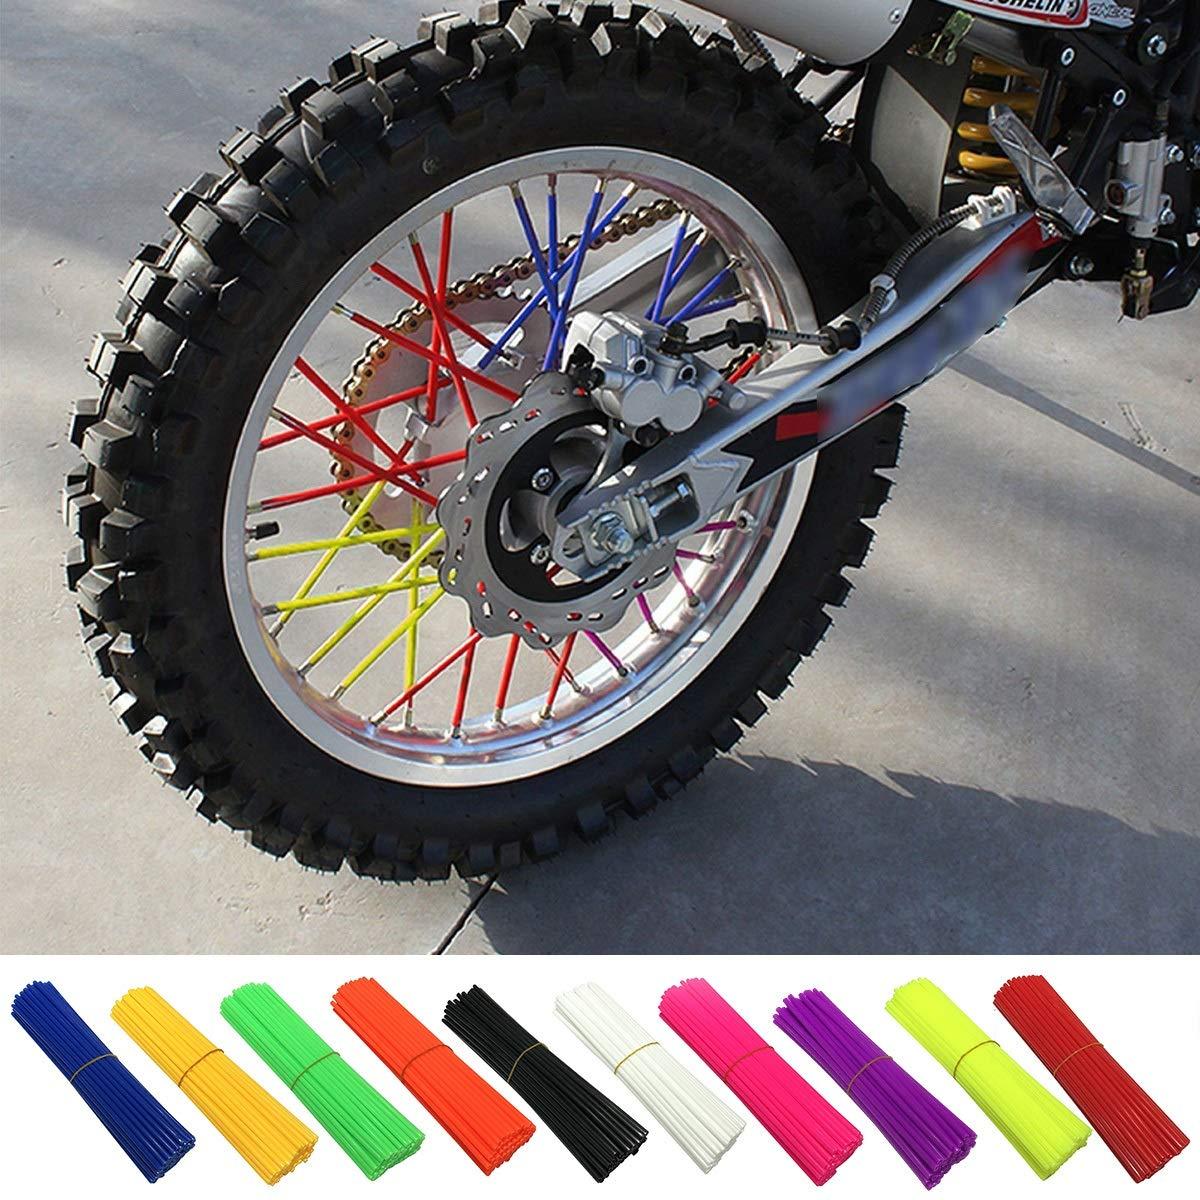 Spoke Skin, 72pcs Universal Colorful Spoke Skins Covers for Motocross Dirt Bike Wheel Rim Guard Protector Wraps (Color : Yellow) None